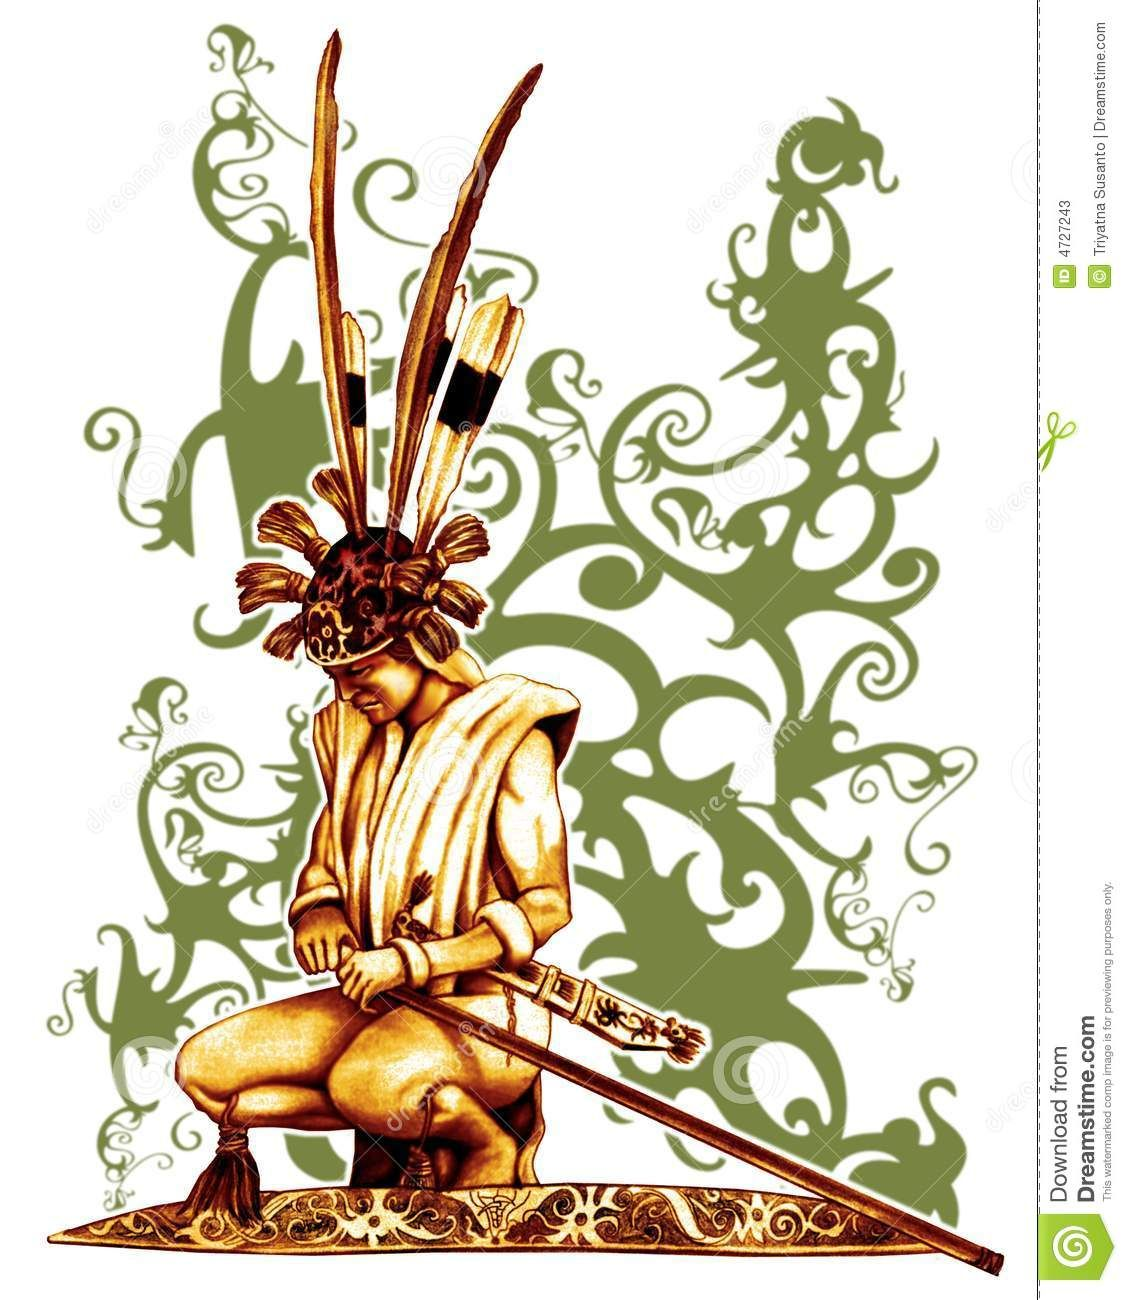 Warrior Of Dayak stock illustration. Illustration of ethnic - 4727243